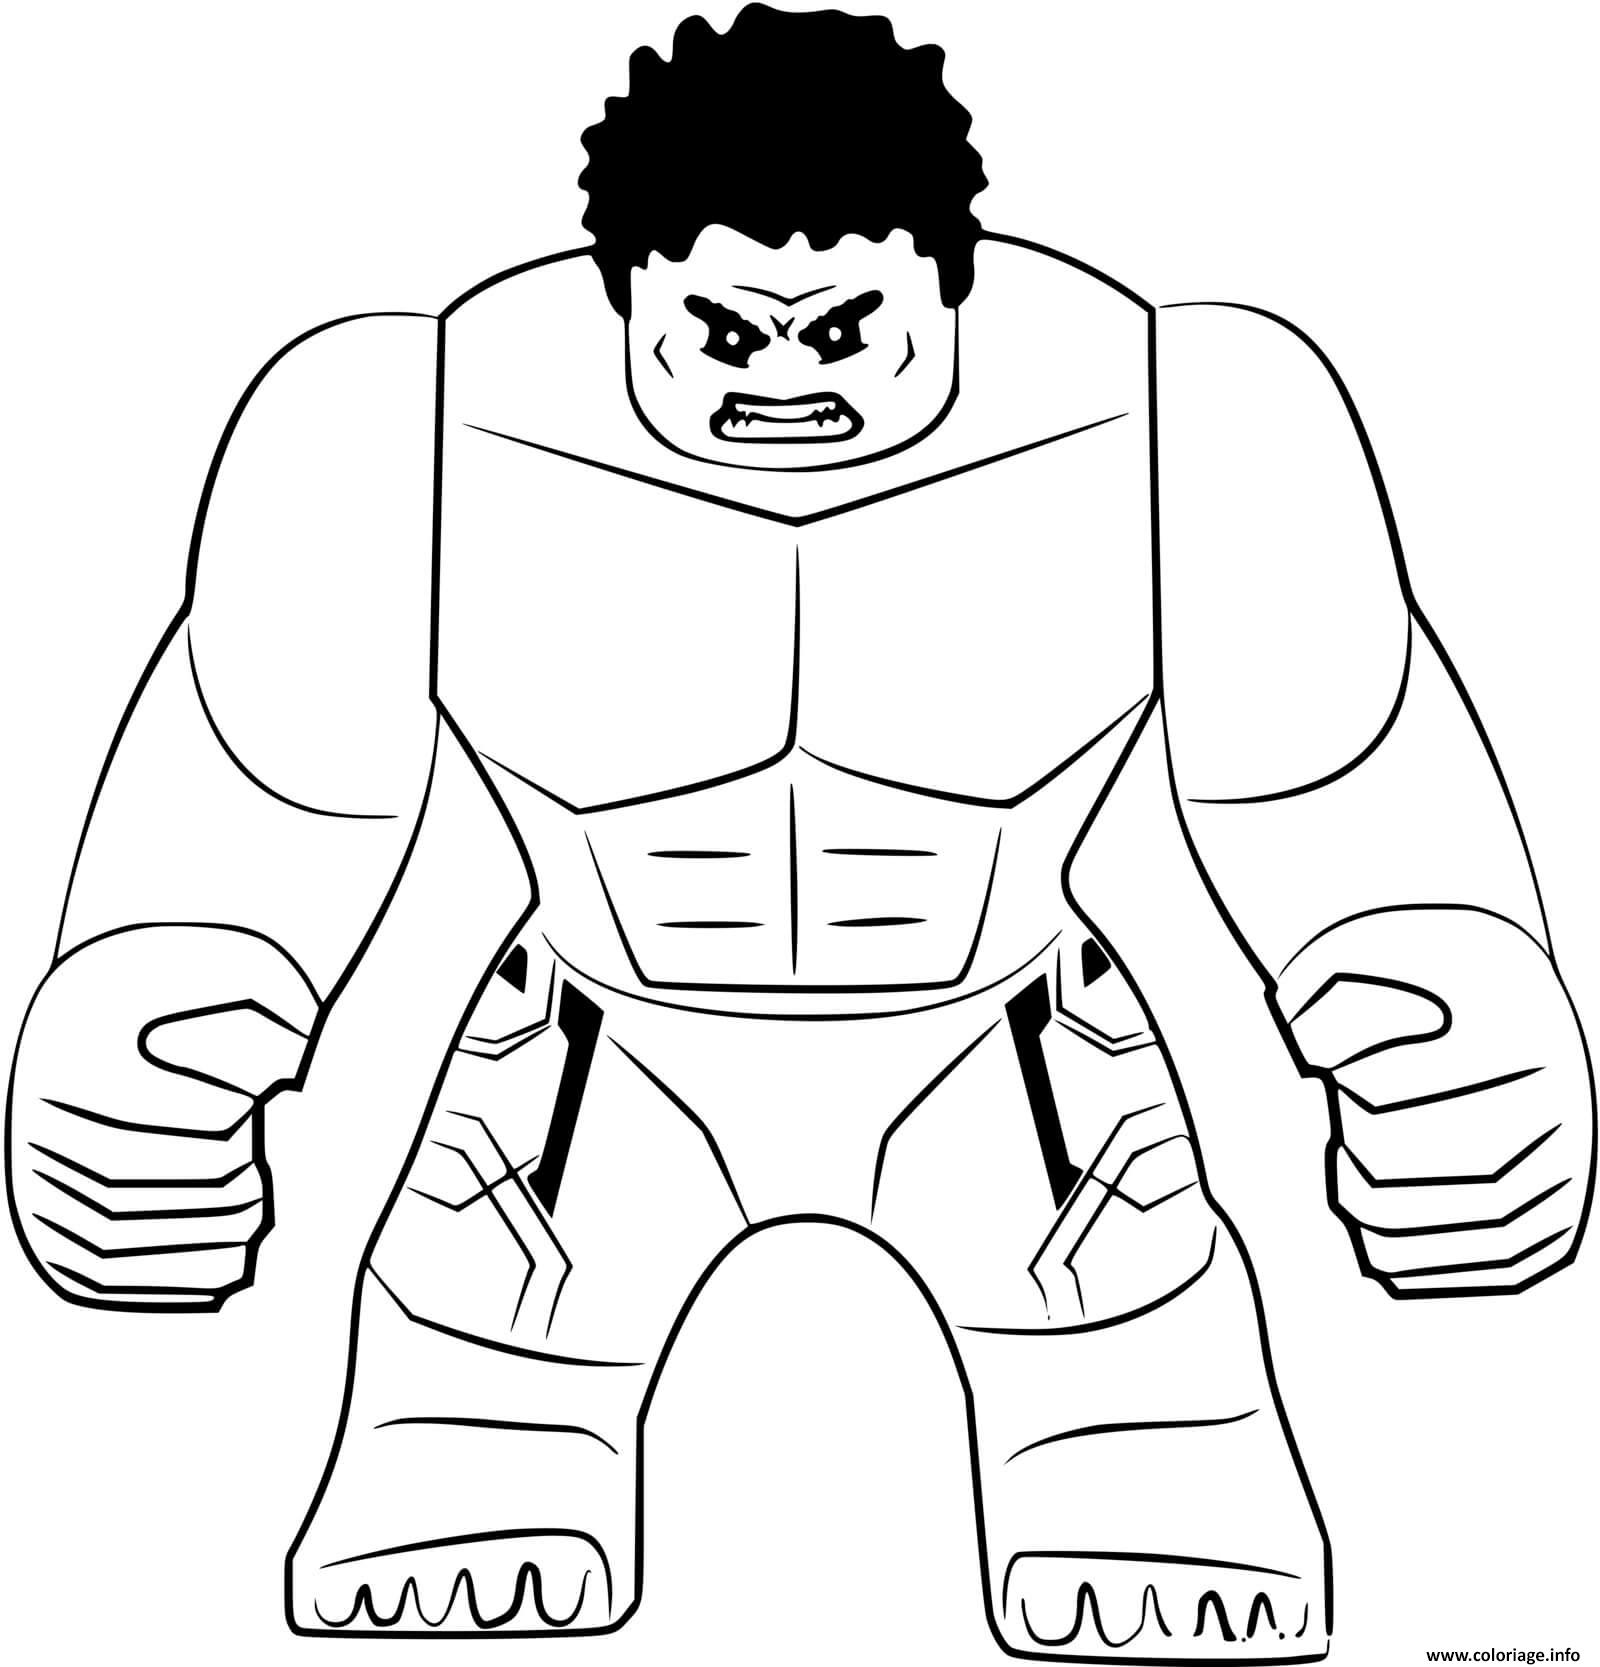 Dessin Lego The Hulk super heros Coloriage Gratuit à Imprimer